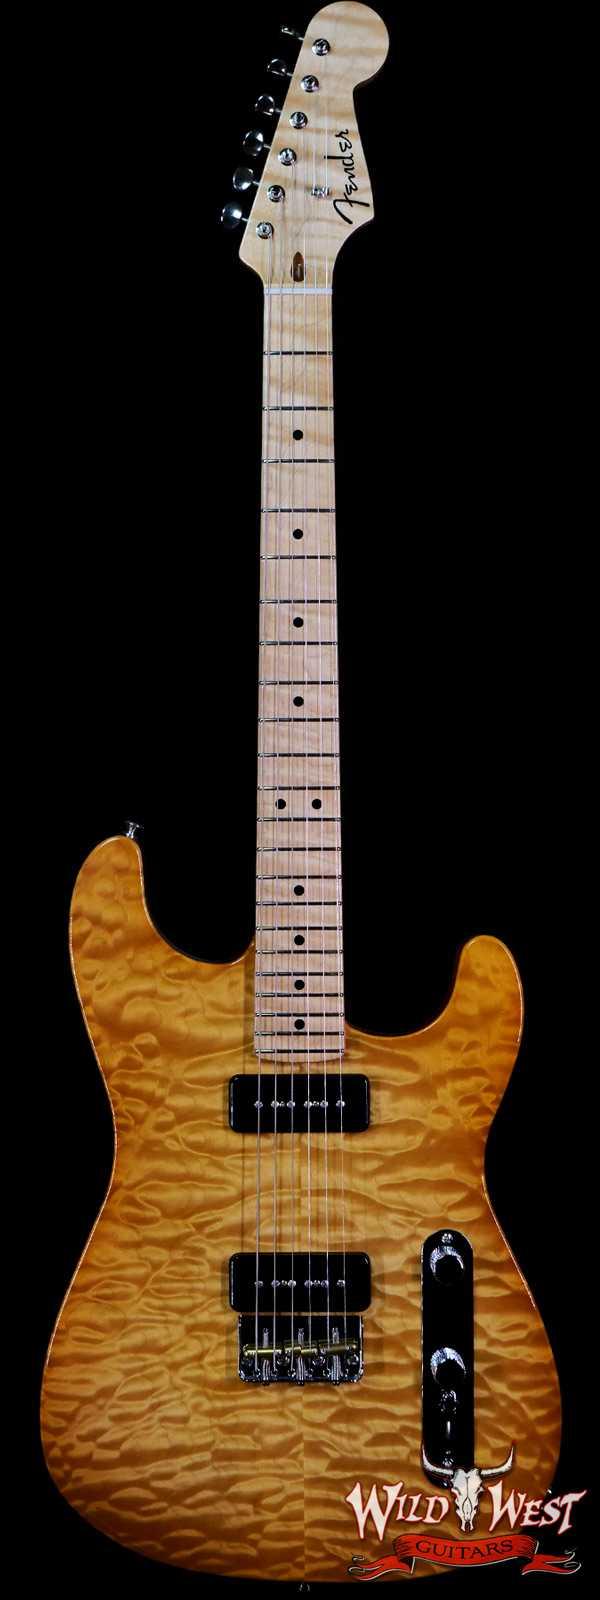 Fender Custom Shop Ron Thorn Masterbuilt Quilt Top Stratocaster P-90 Chambered Mahogany Body AA Flame Neck Honey Burst